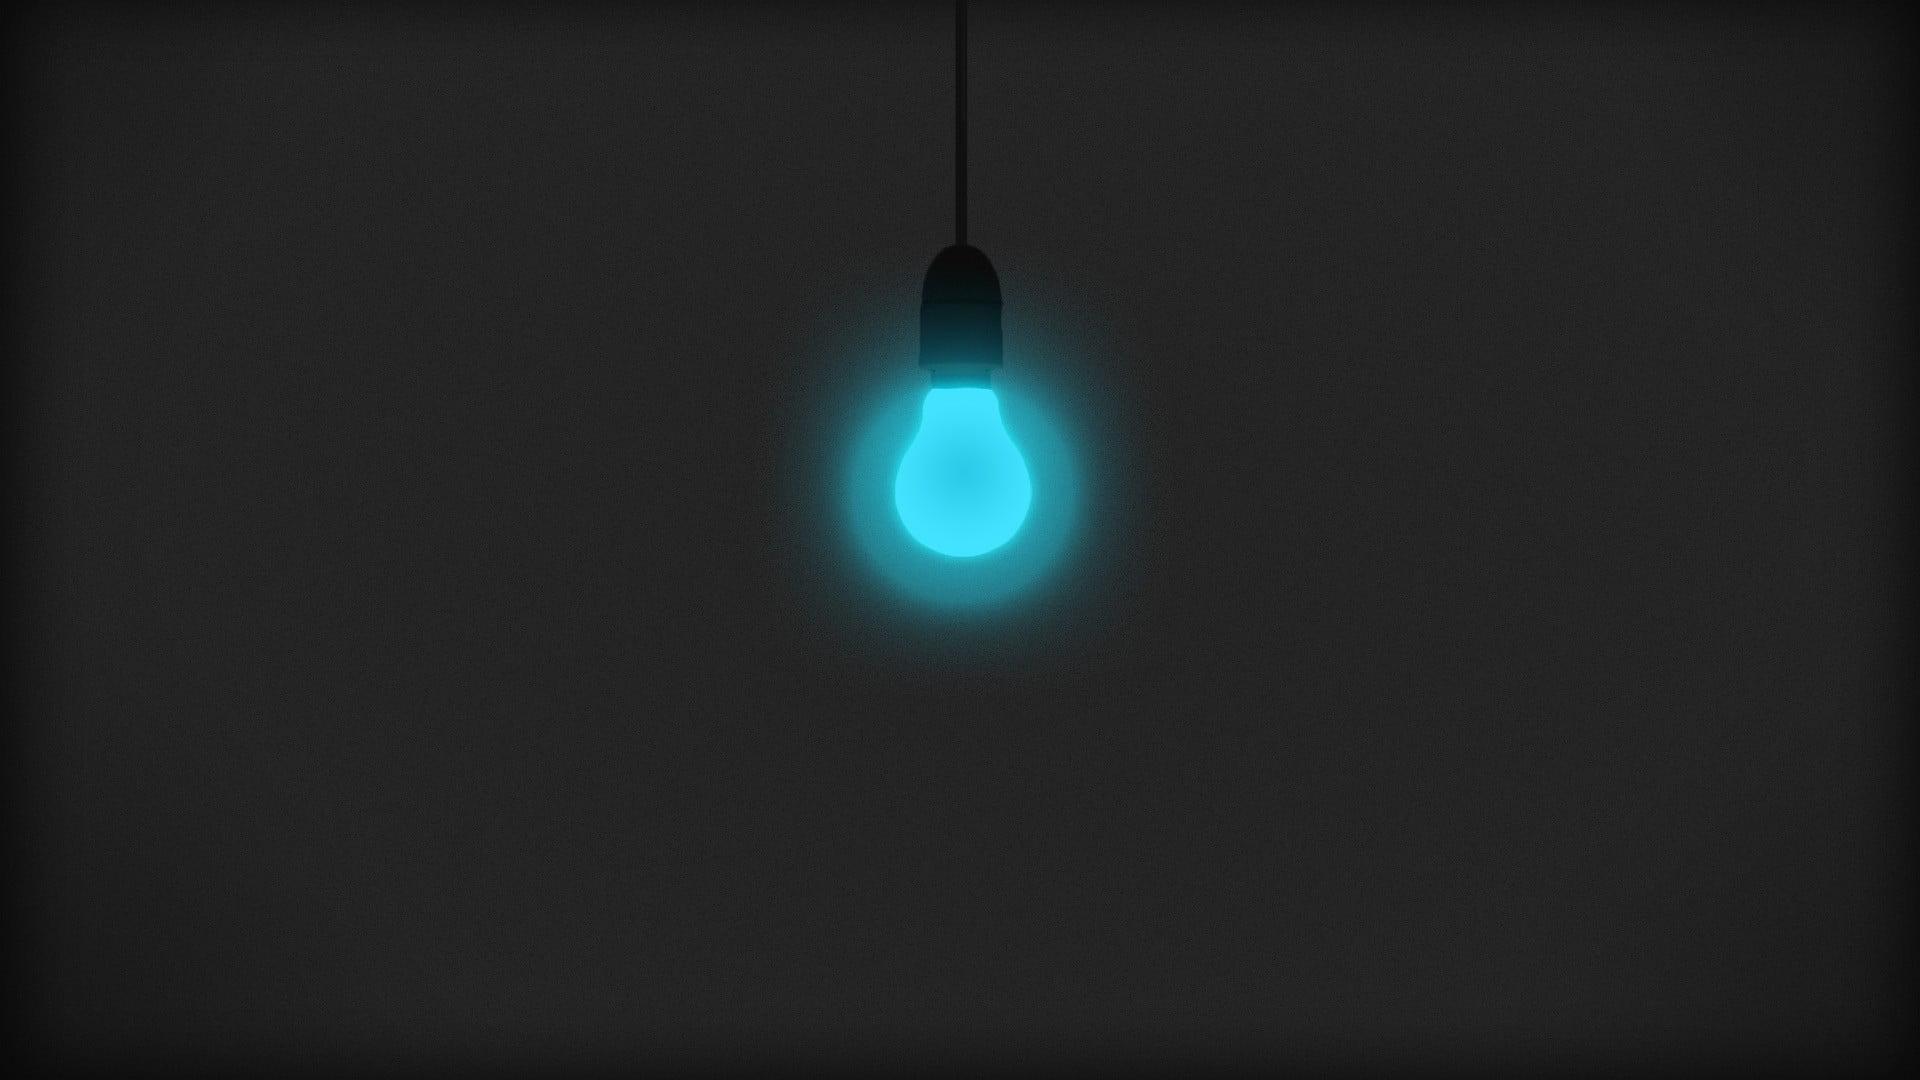 Incandescent light bulb minimalism lights HD wallpaper 1920x1080